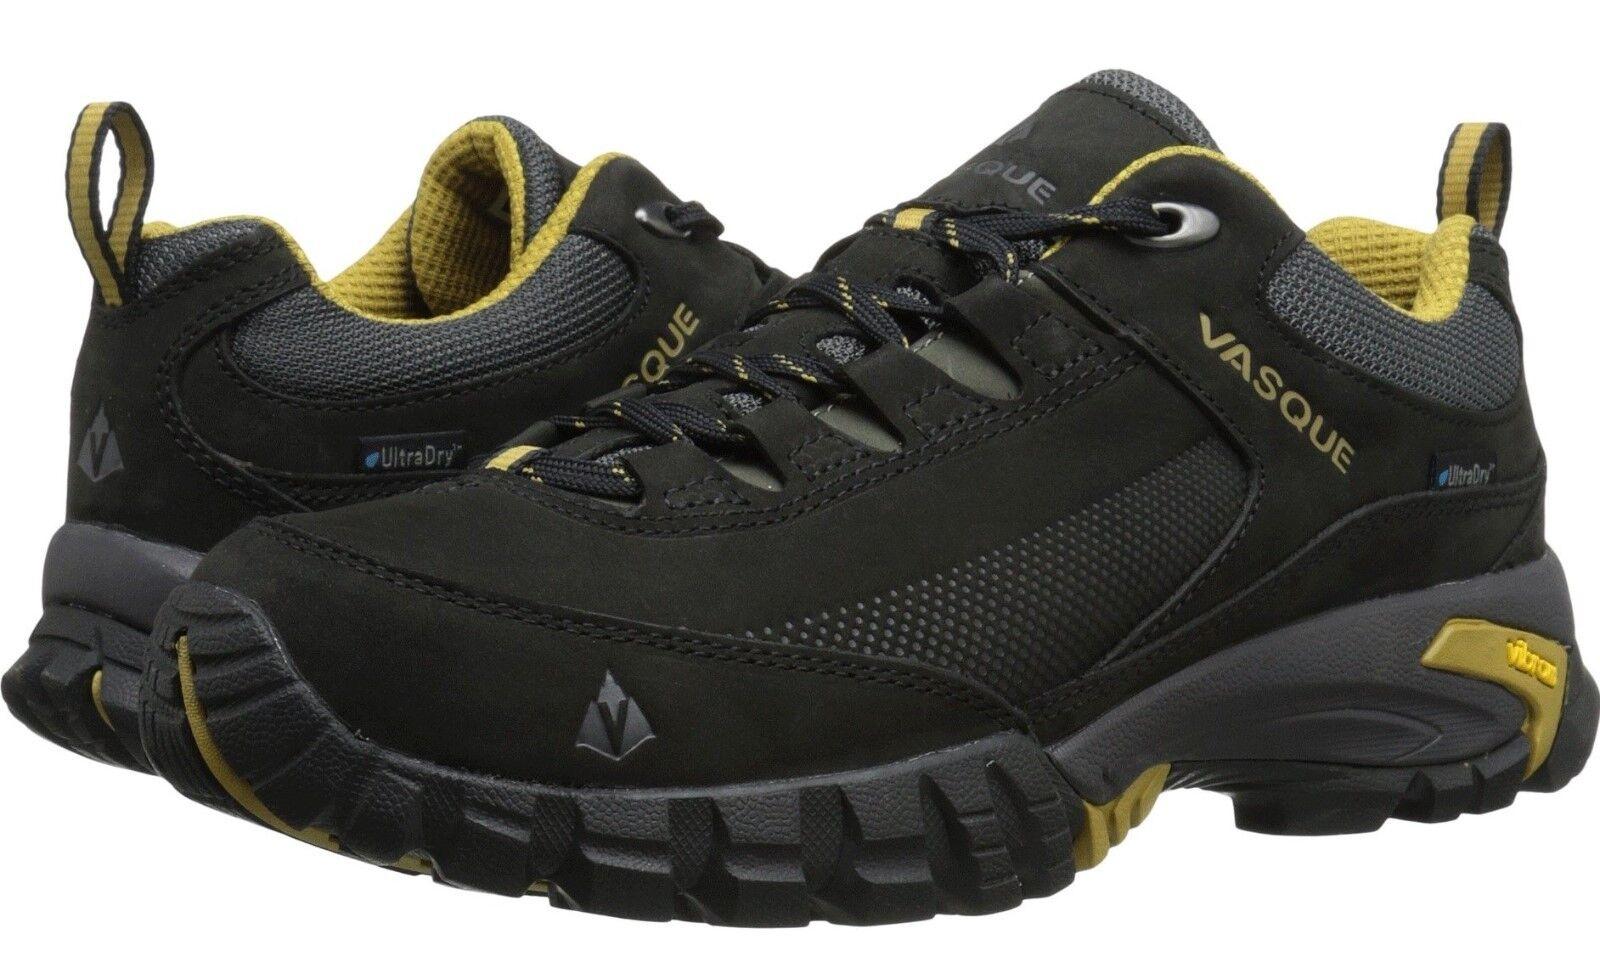 Vasque Talus Trek Low UltraDry scarpe da ginnastica Mens Hiking  scarpe Backpacking Waterrepellente  presa di marca